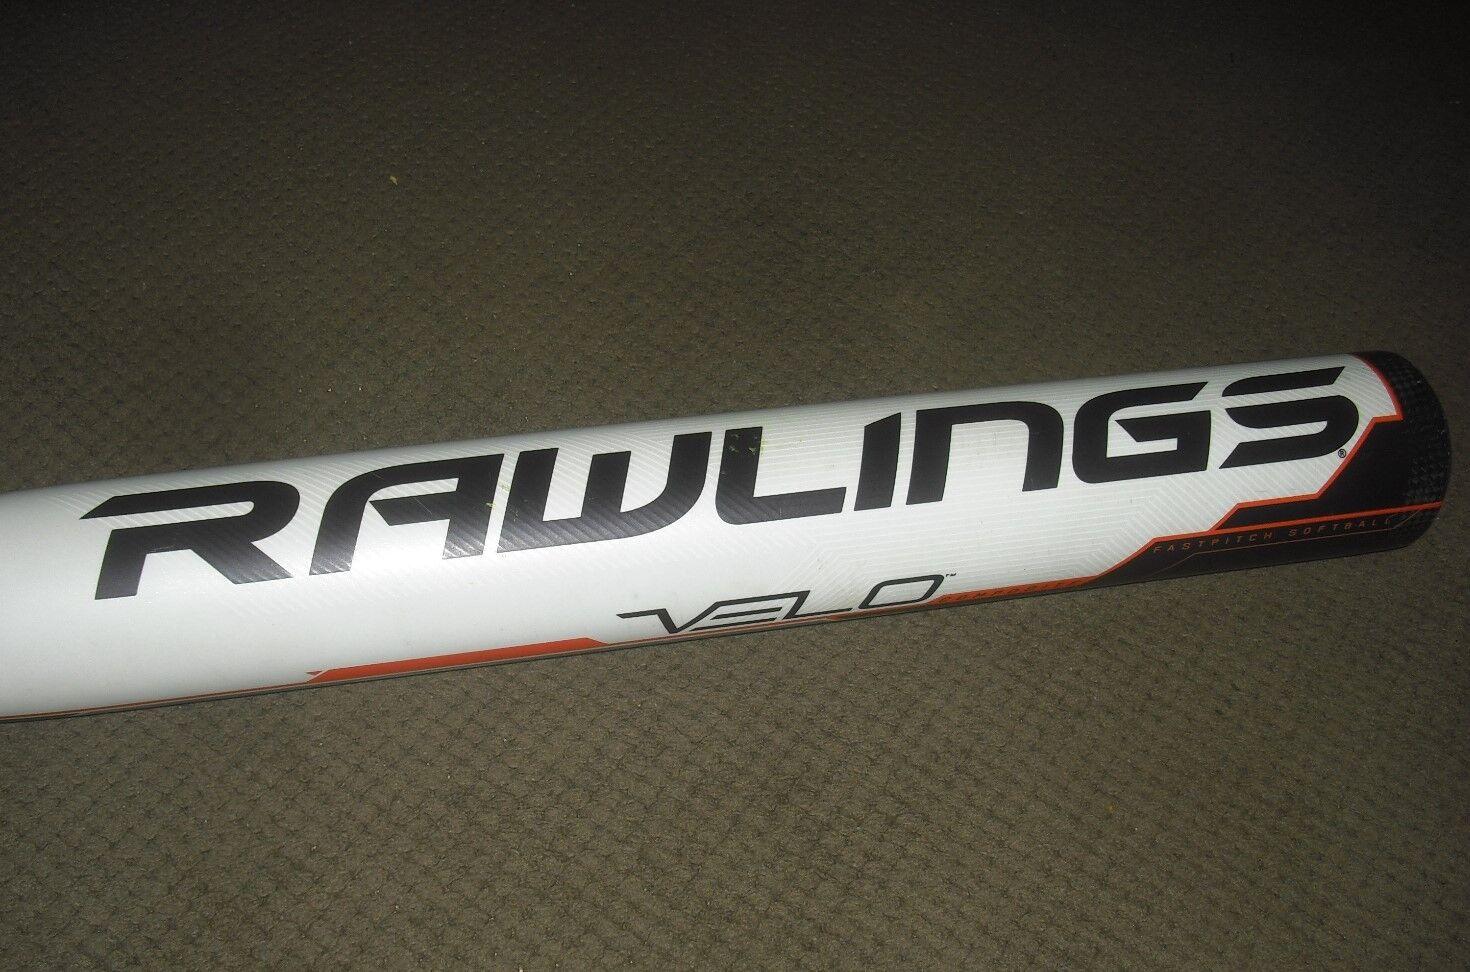 2018 Rawlings VELO VELO VELO 2 1/4″ Composite Fastpitch Softball Bat FP8V9 34/25 -9 USSSA 4f2b63